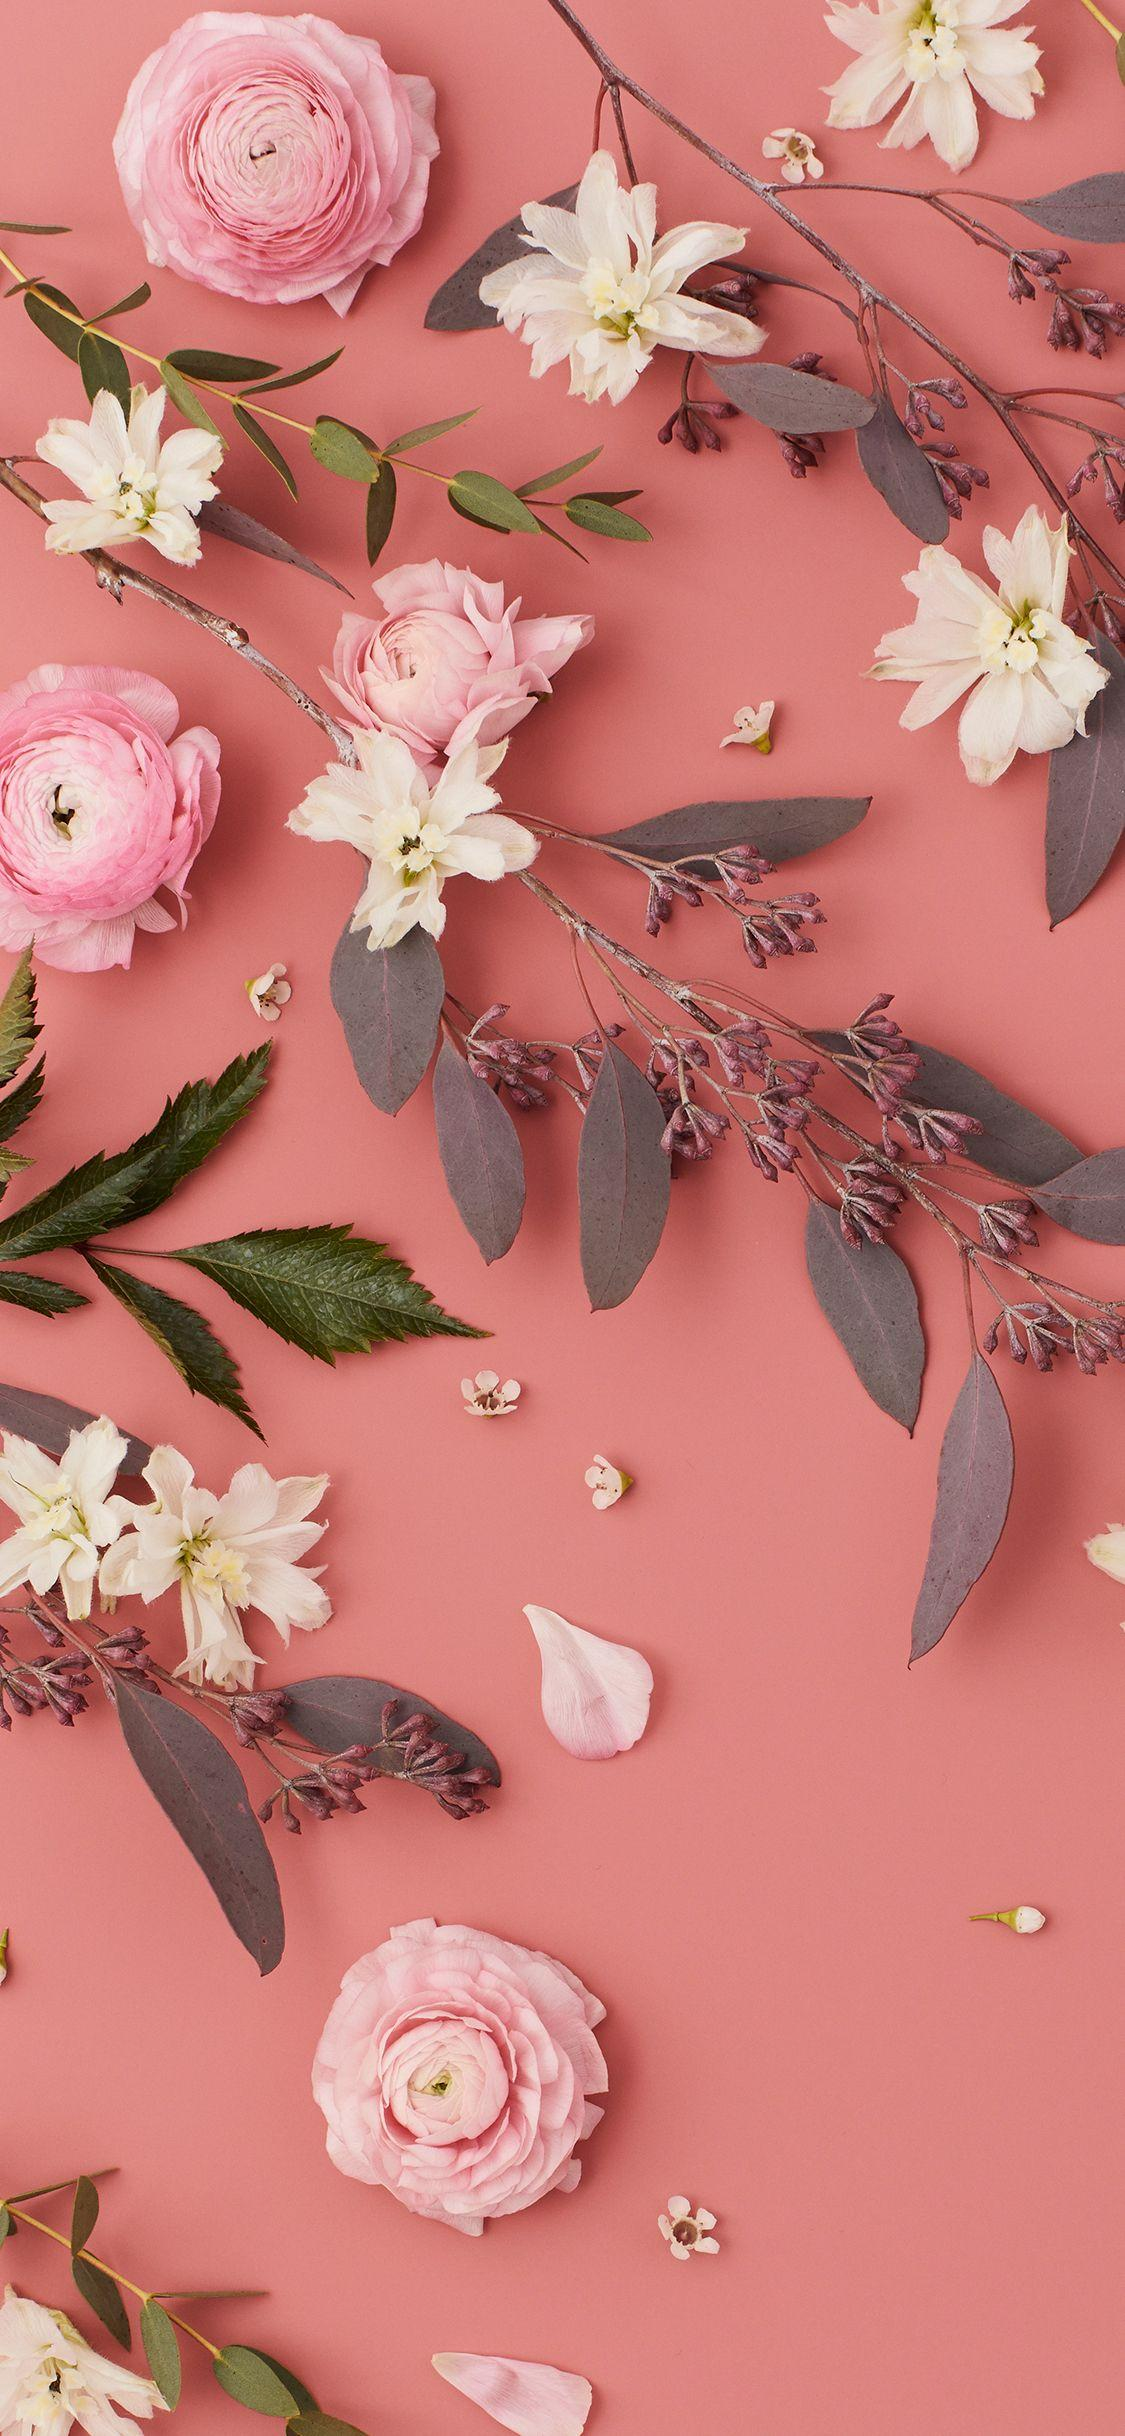 Wallpapers Pink Flower - Wallpaper Cave